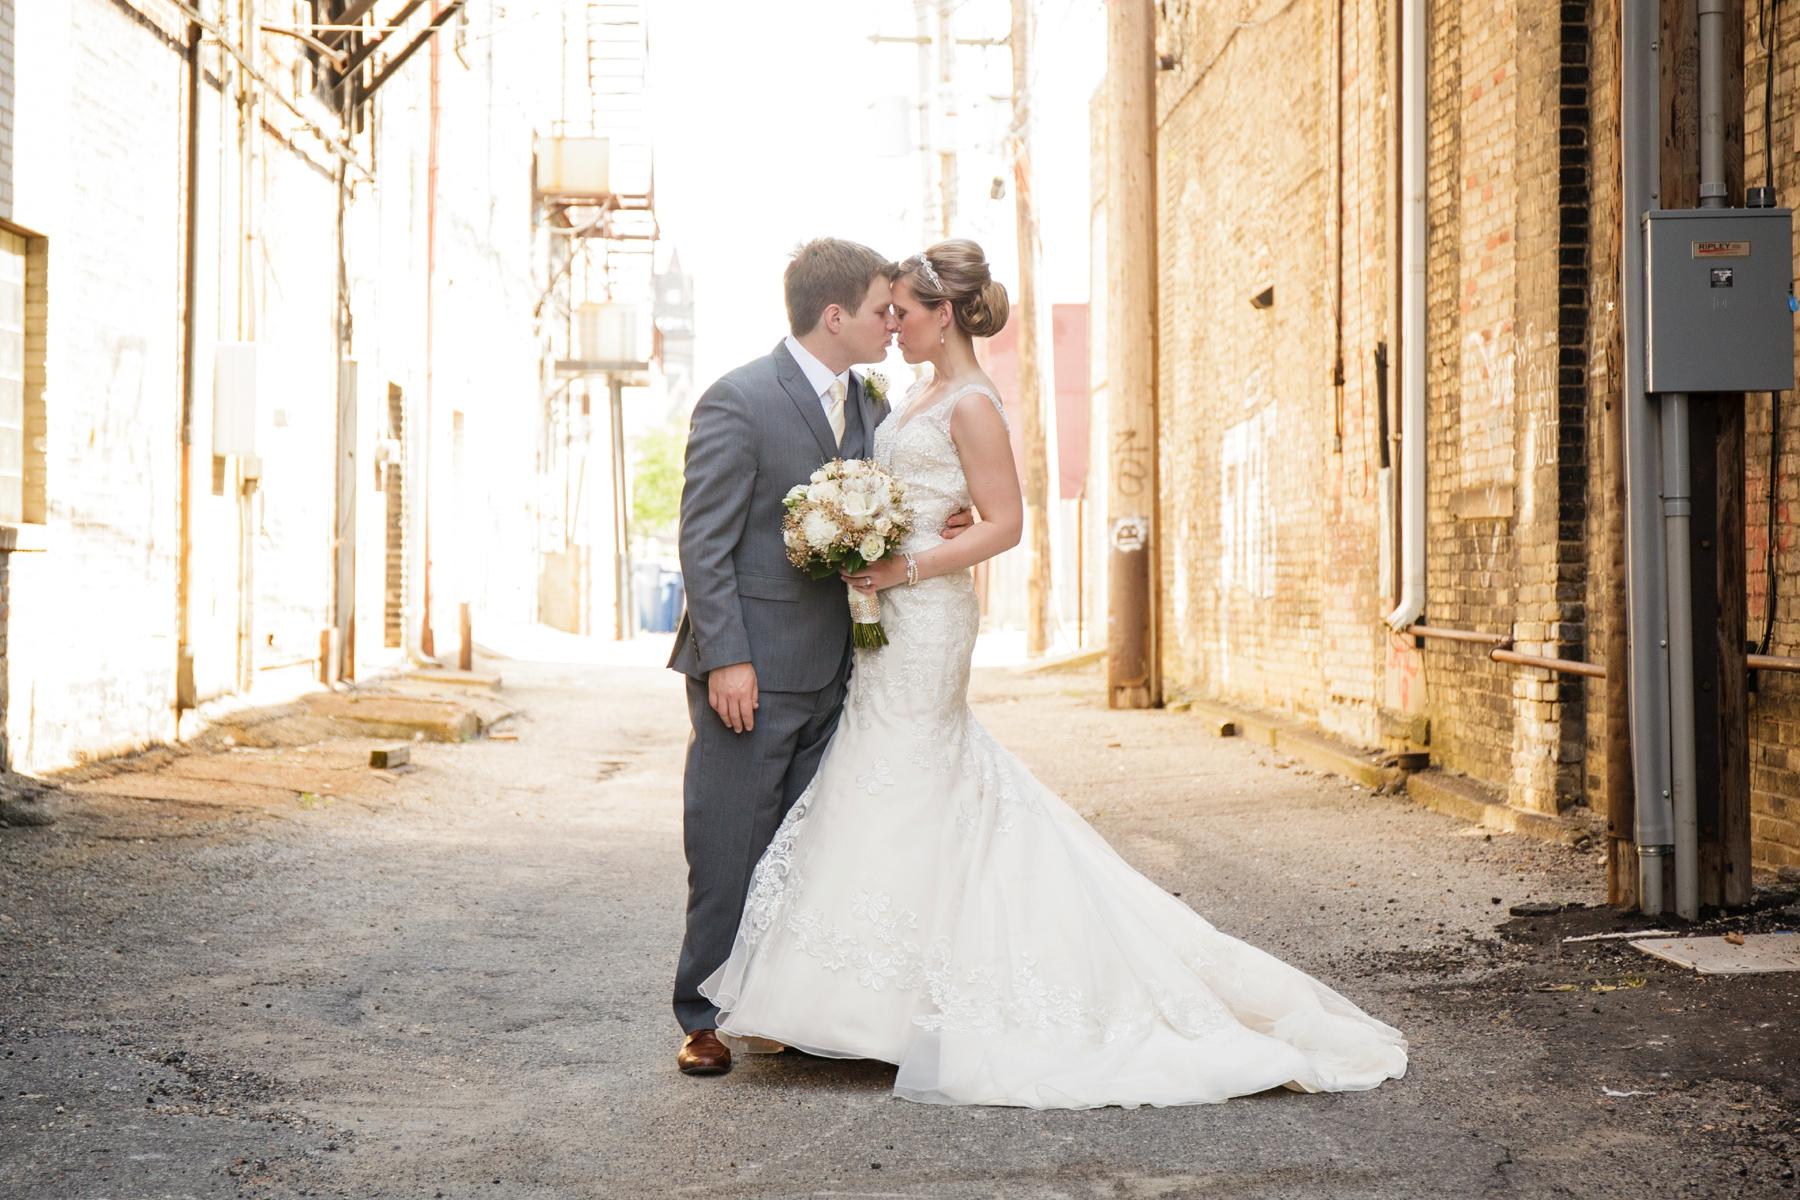 Ben_Jillian_Midland_Baycity_Wedding_0060.jpg